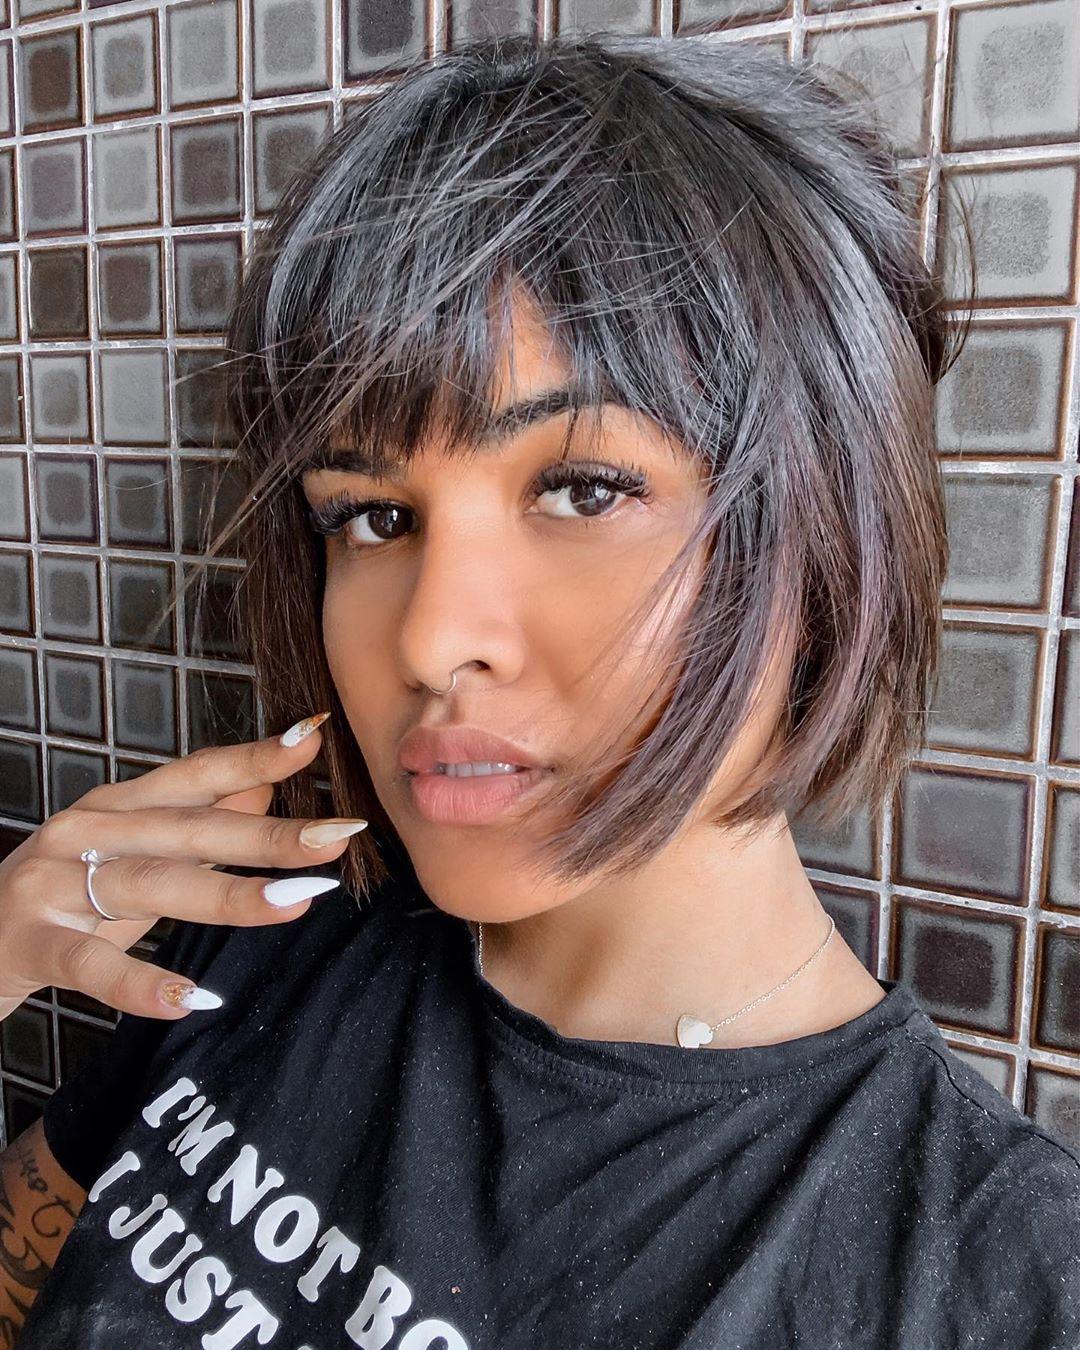 тренды для коротких волос фото 7